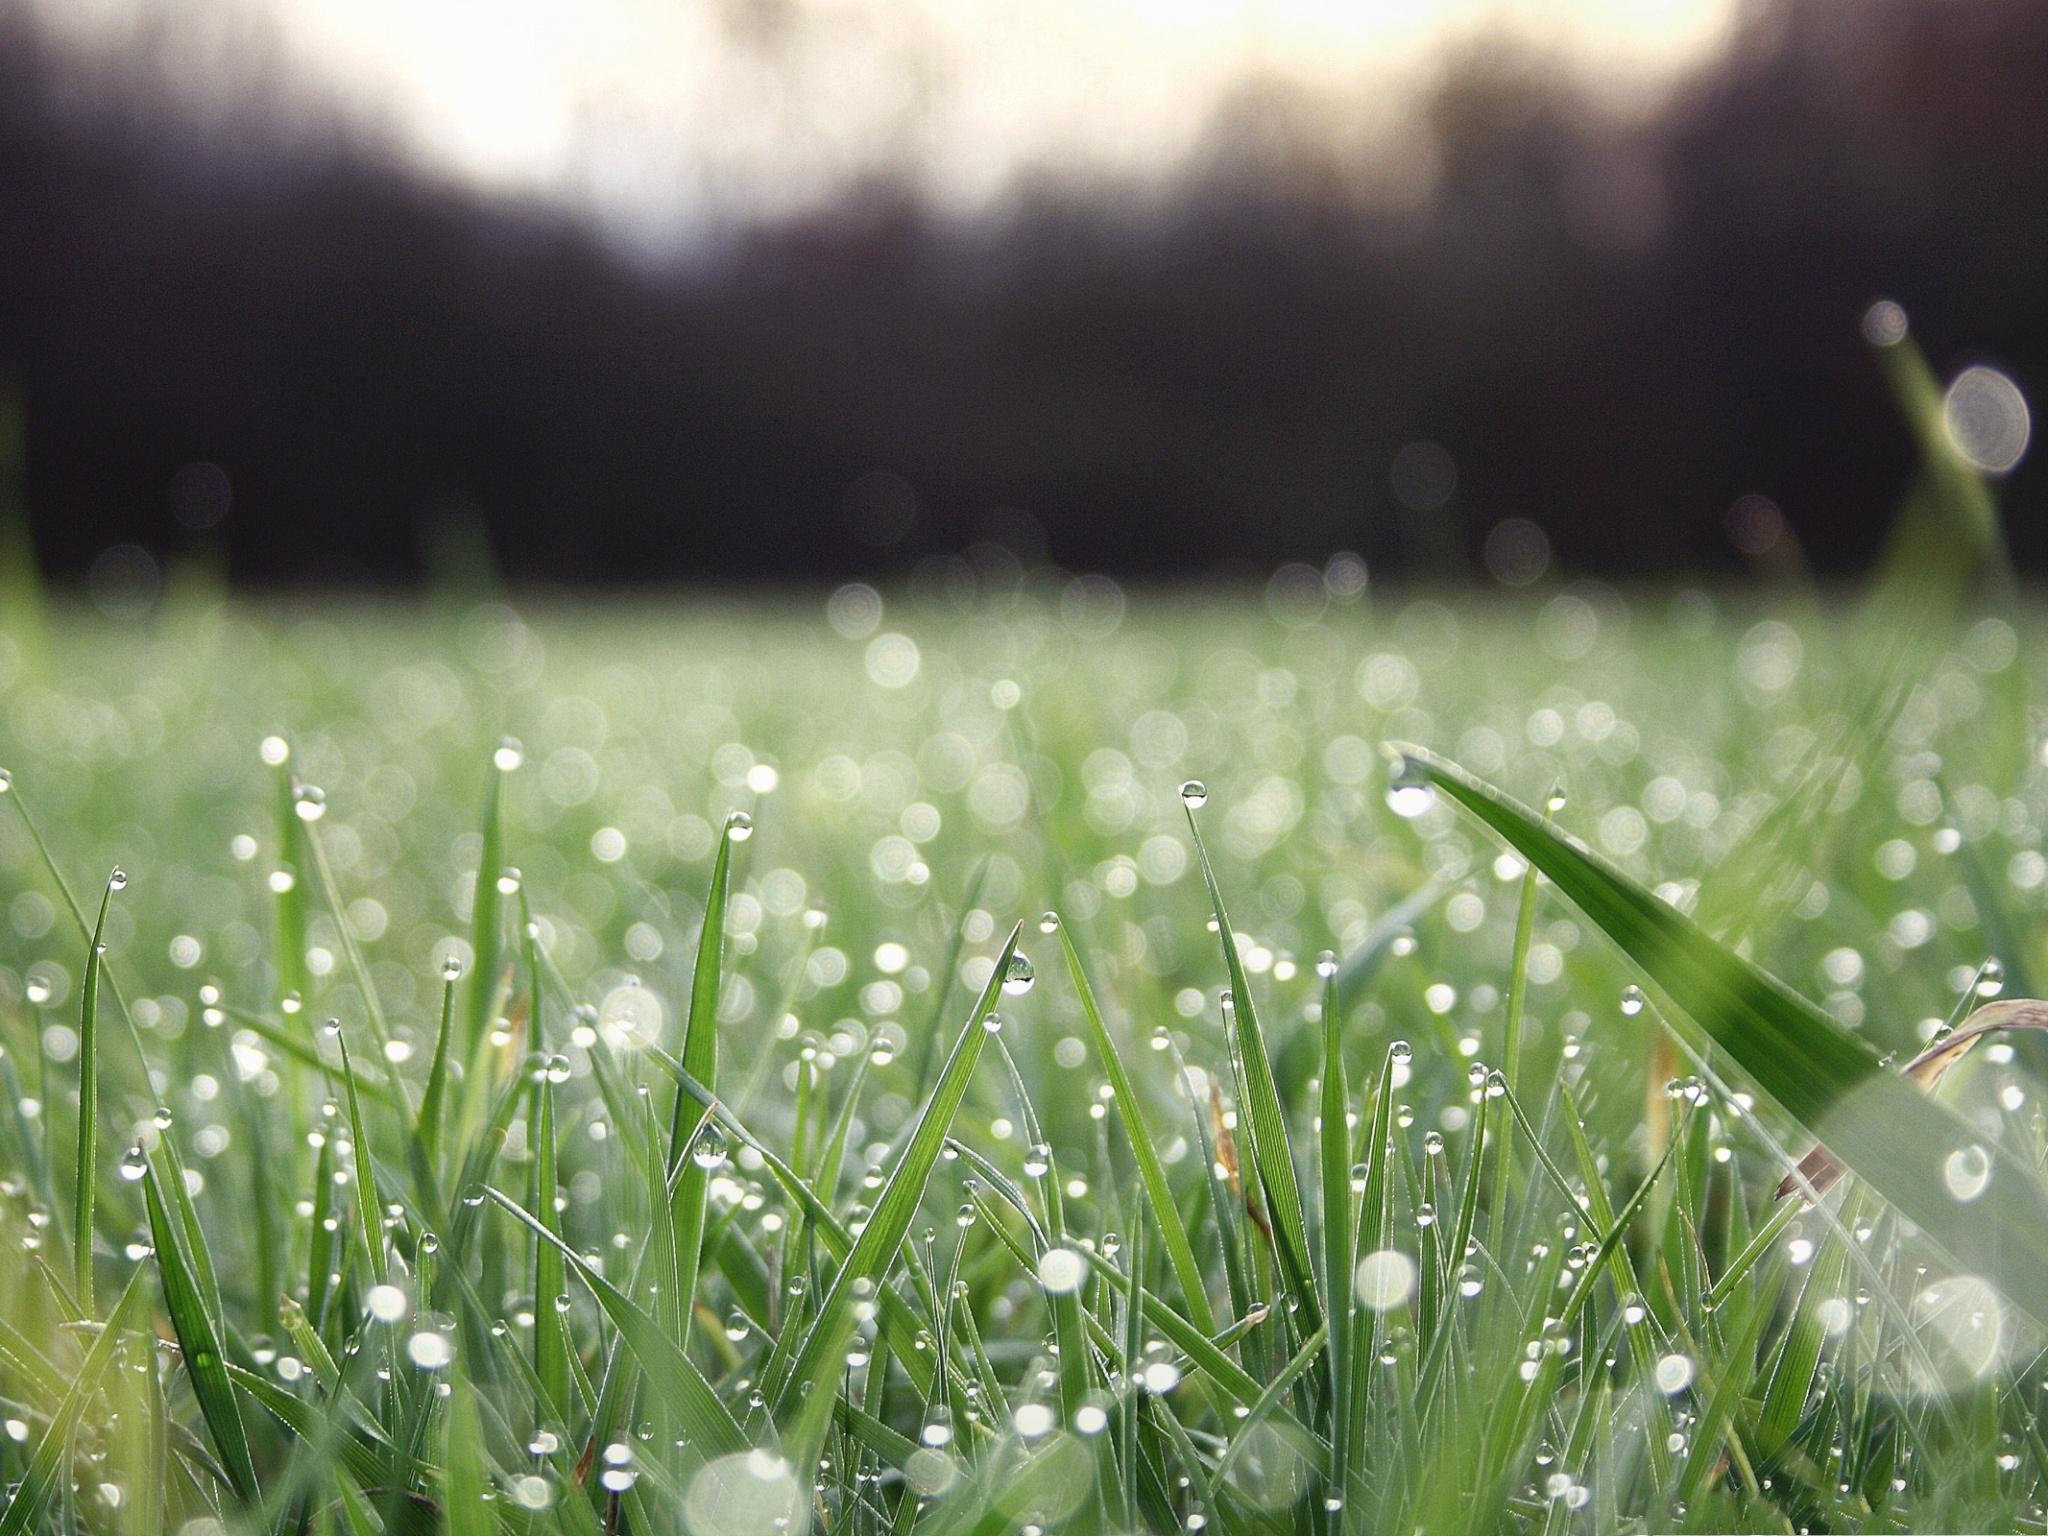 Raindrops on plants